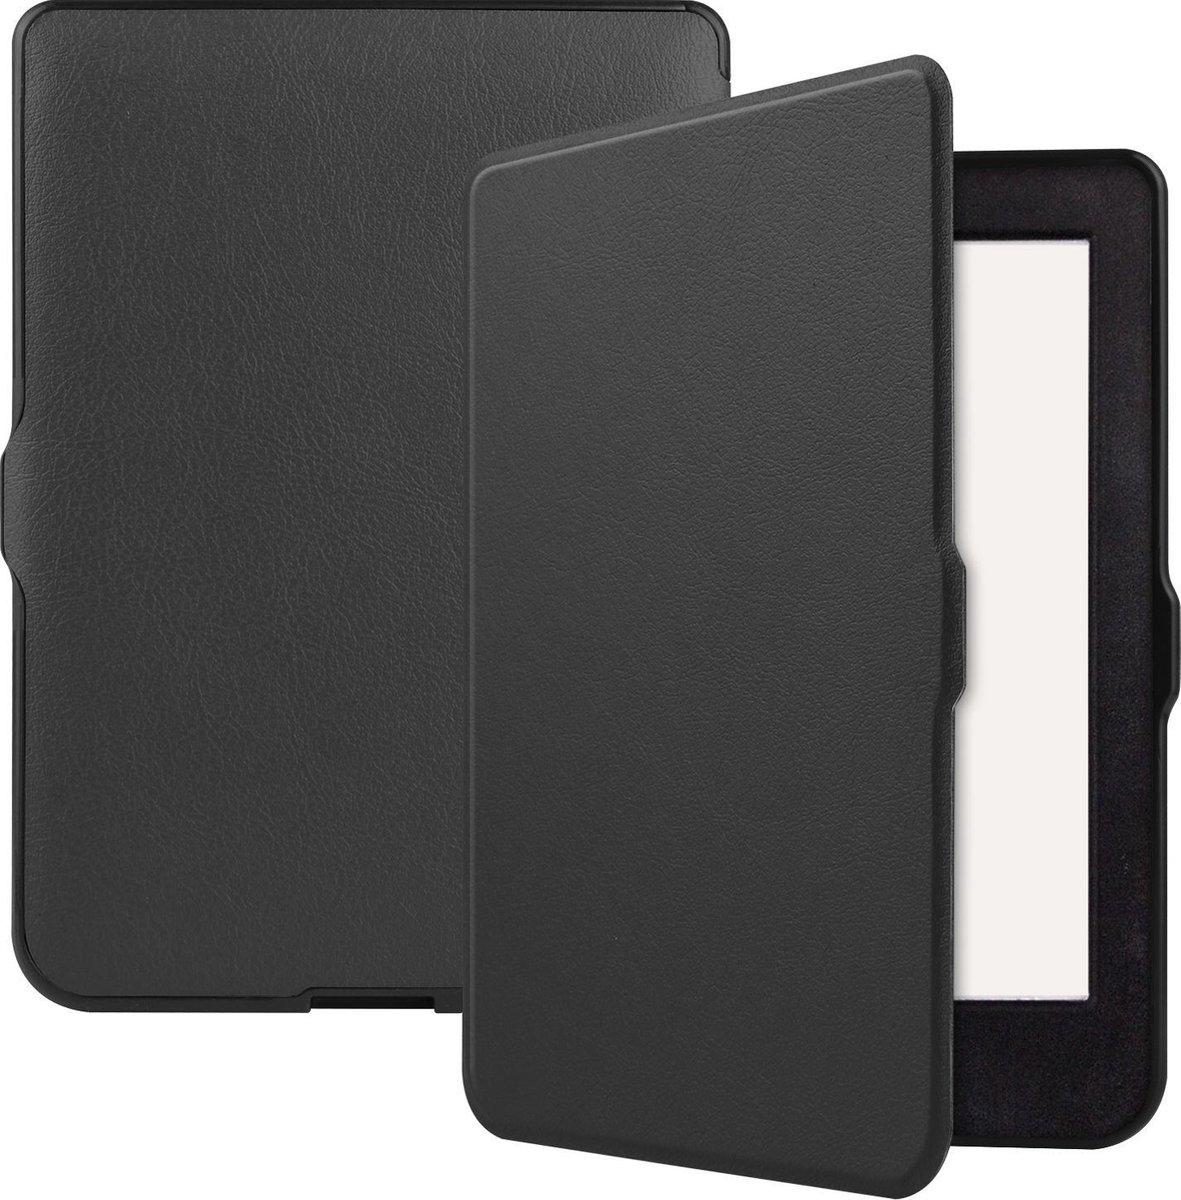 Kobo Nia Hoes - Kobo E-Reader Sleepcover - Zwart